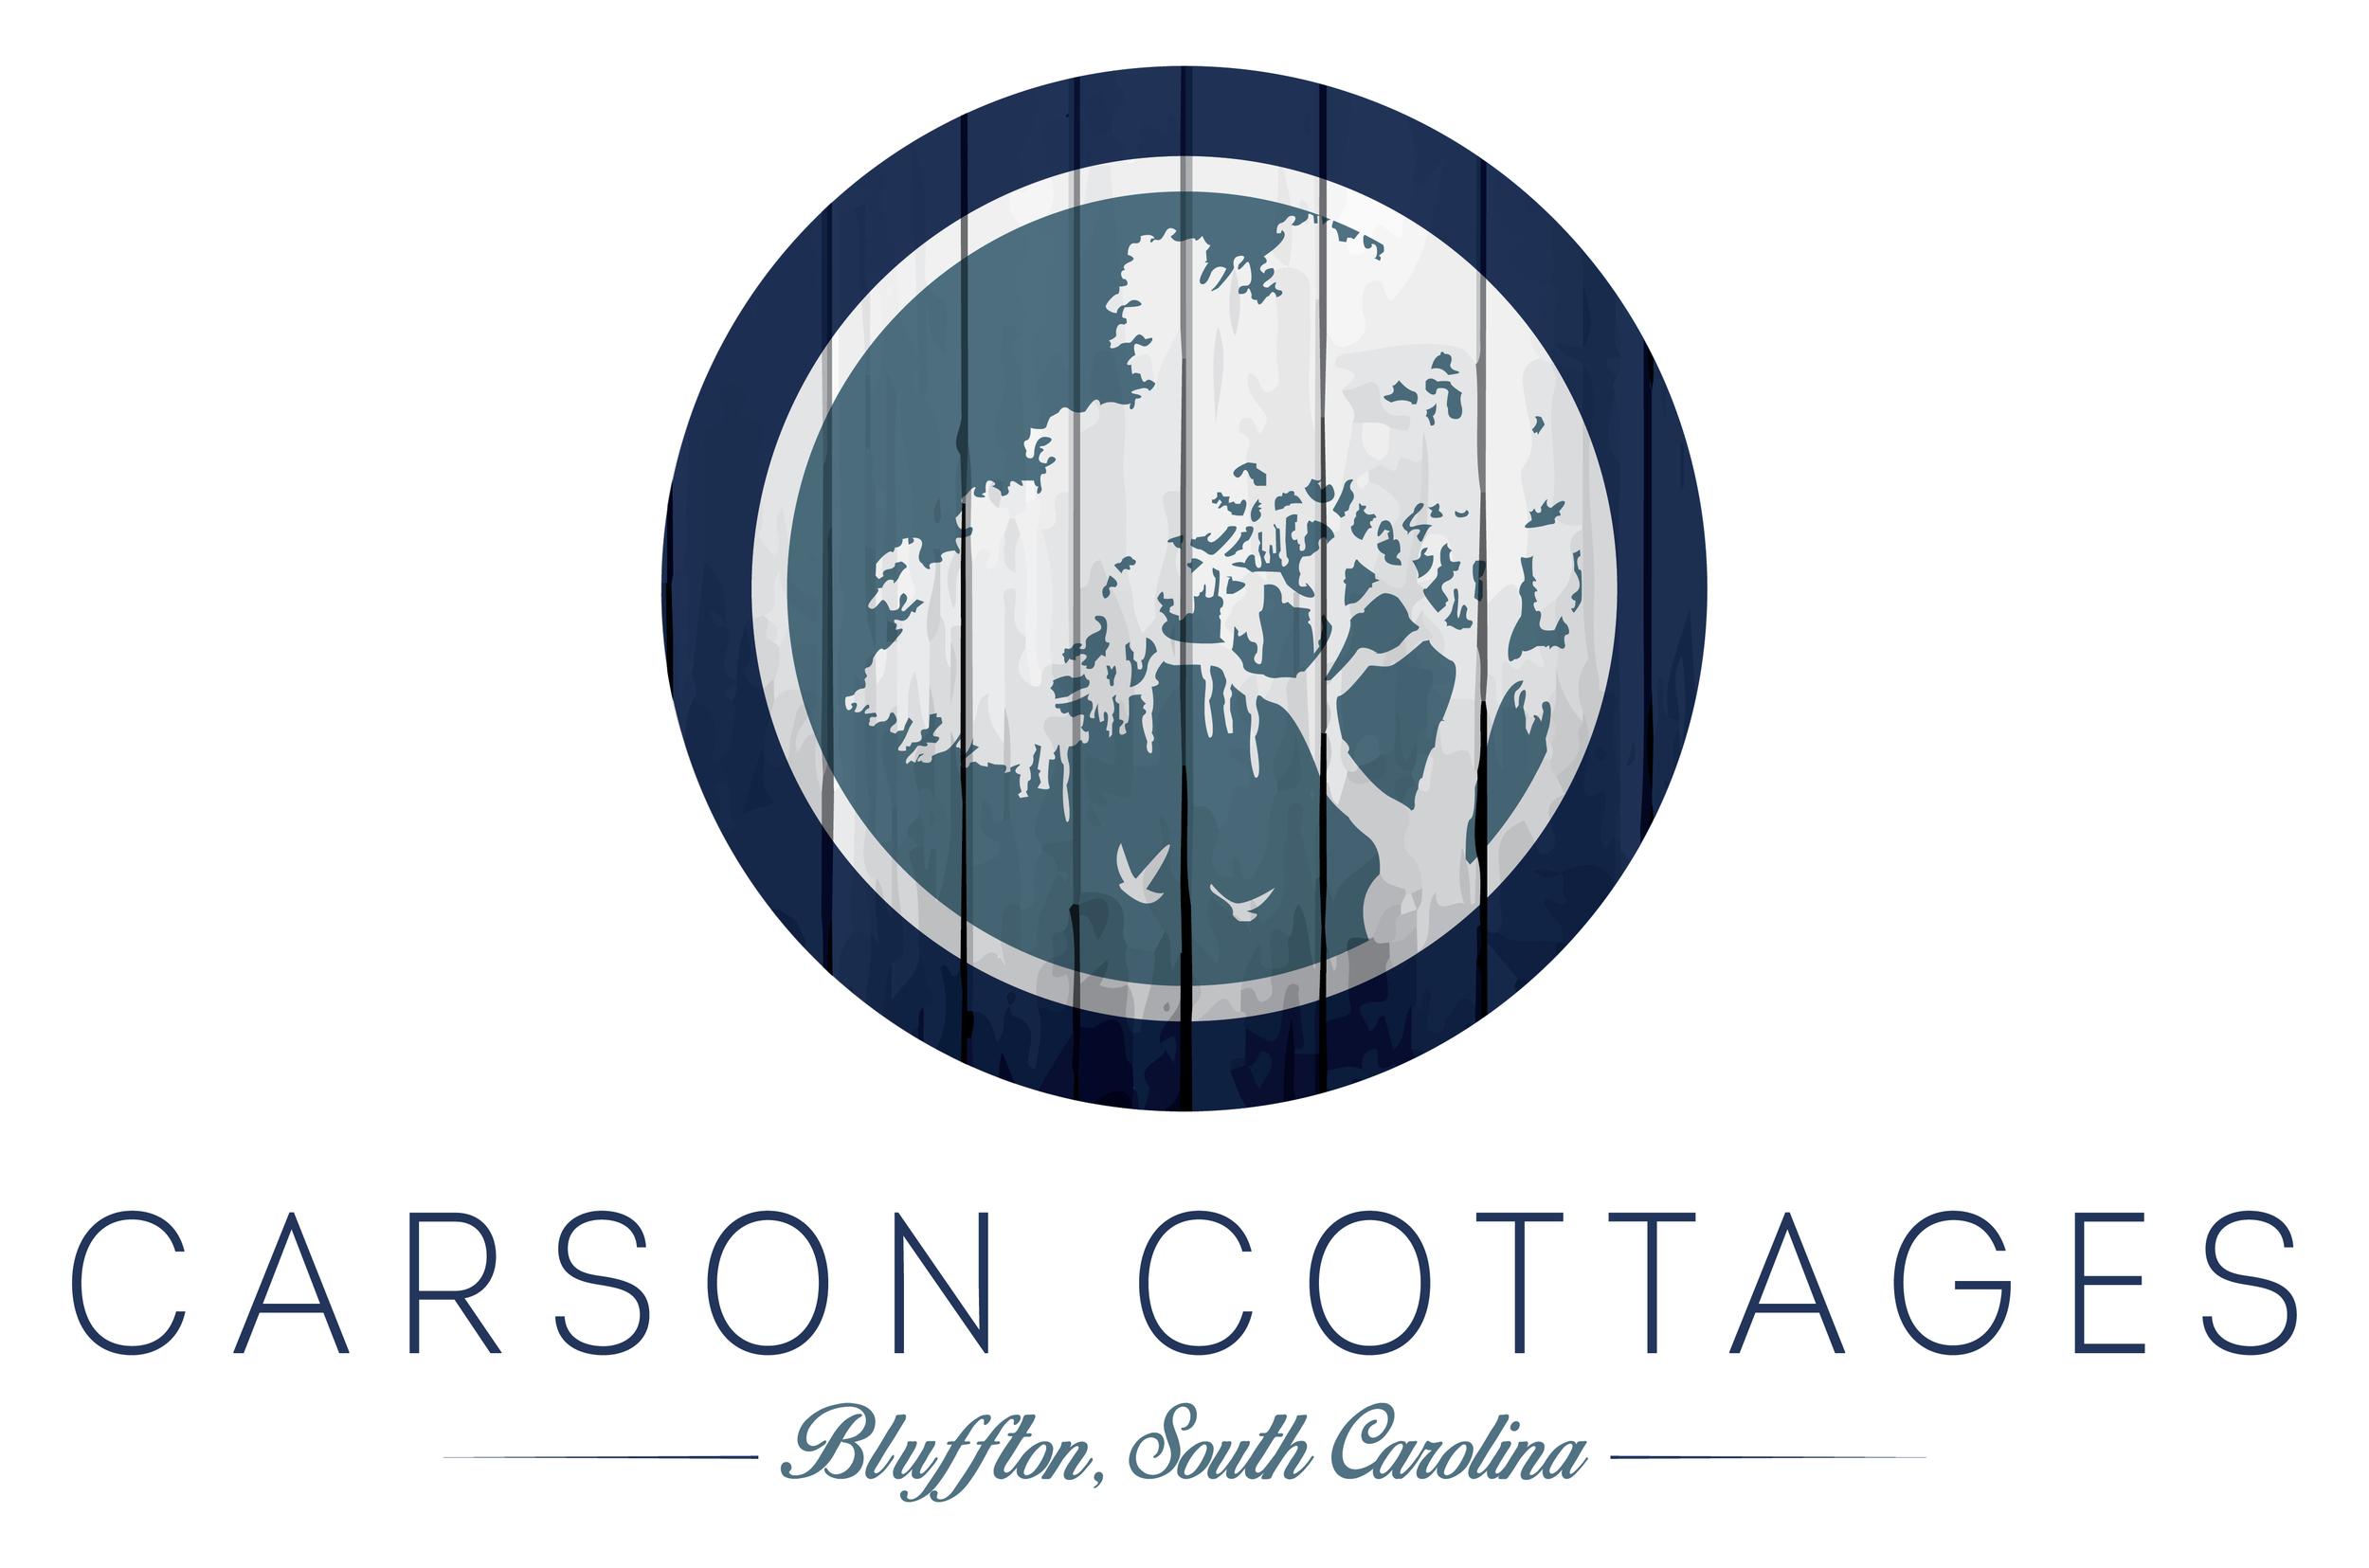 Carson-Cottages-MAIN-WEB-LARGE.jpg